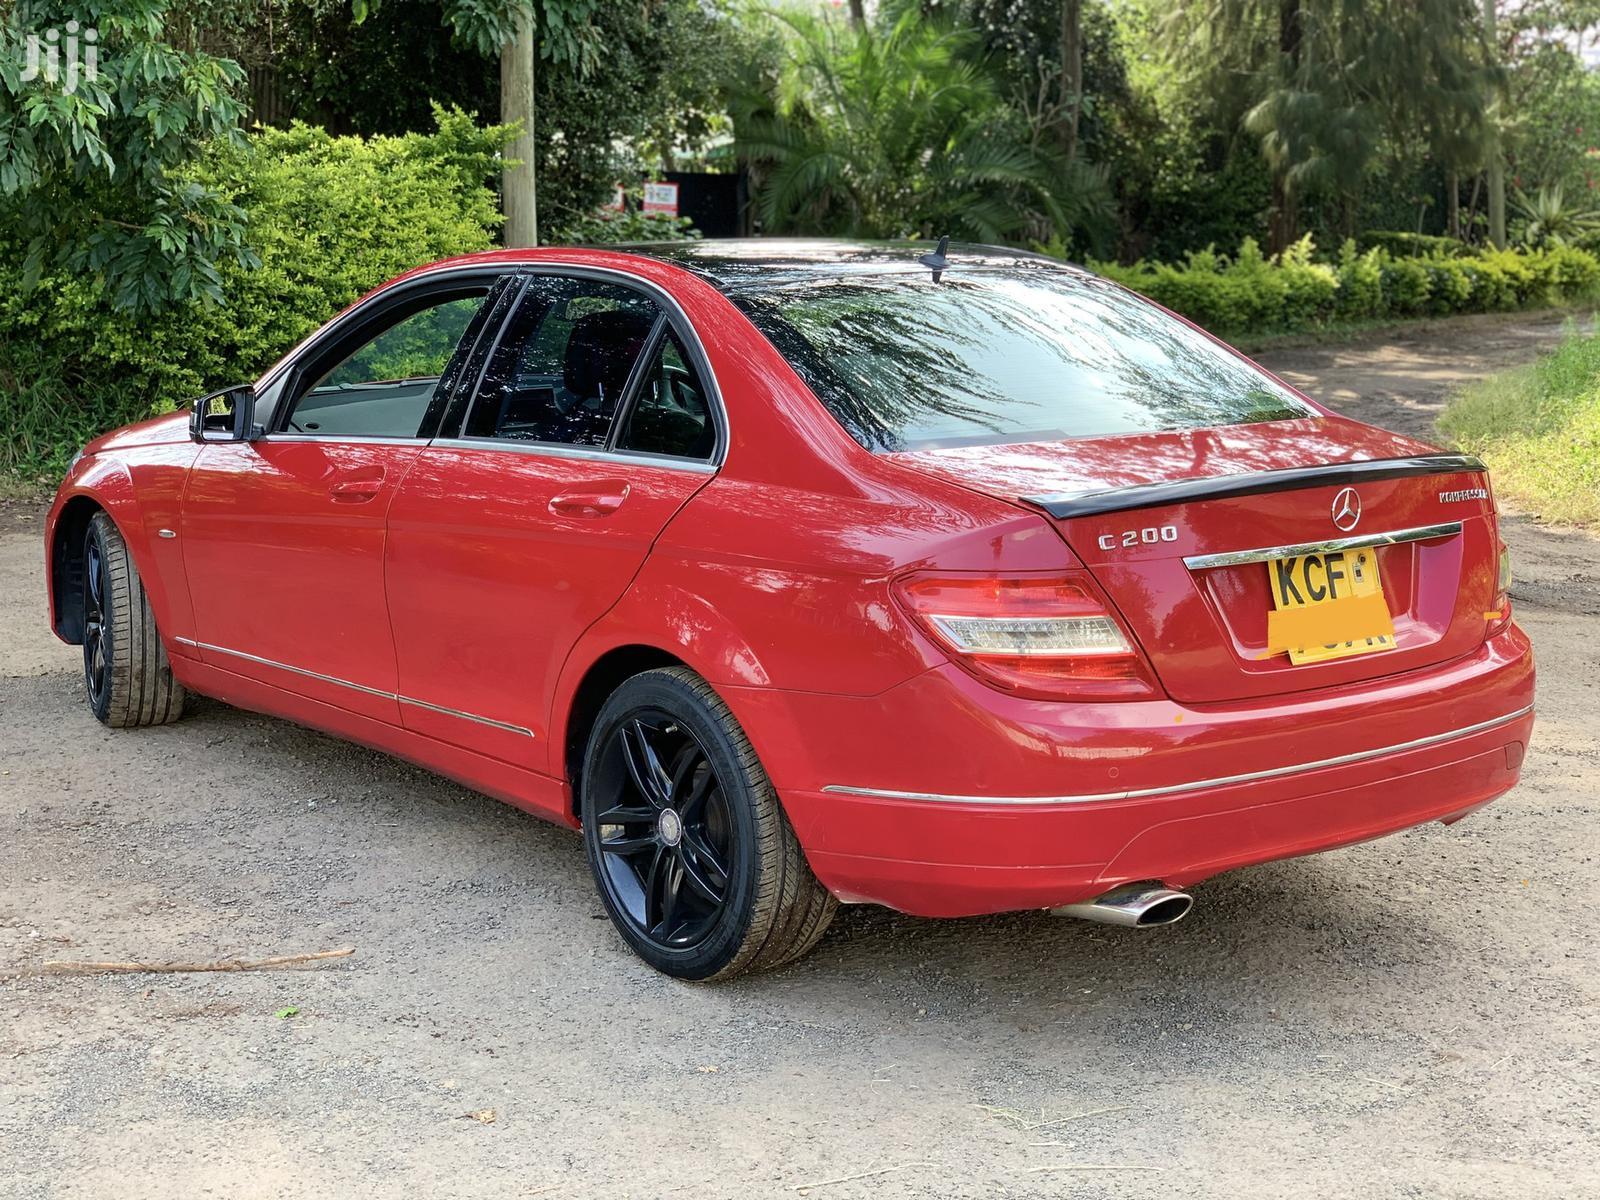 Mercedes-Benz C200 2008 Red | Cars for sale in Langata, Nairobi, Kenya